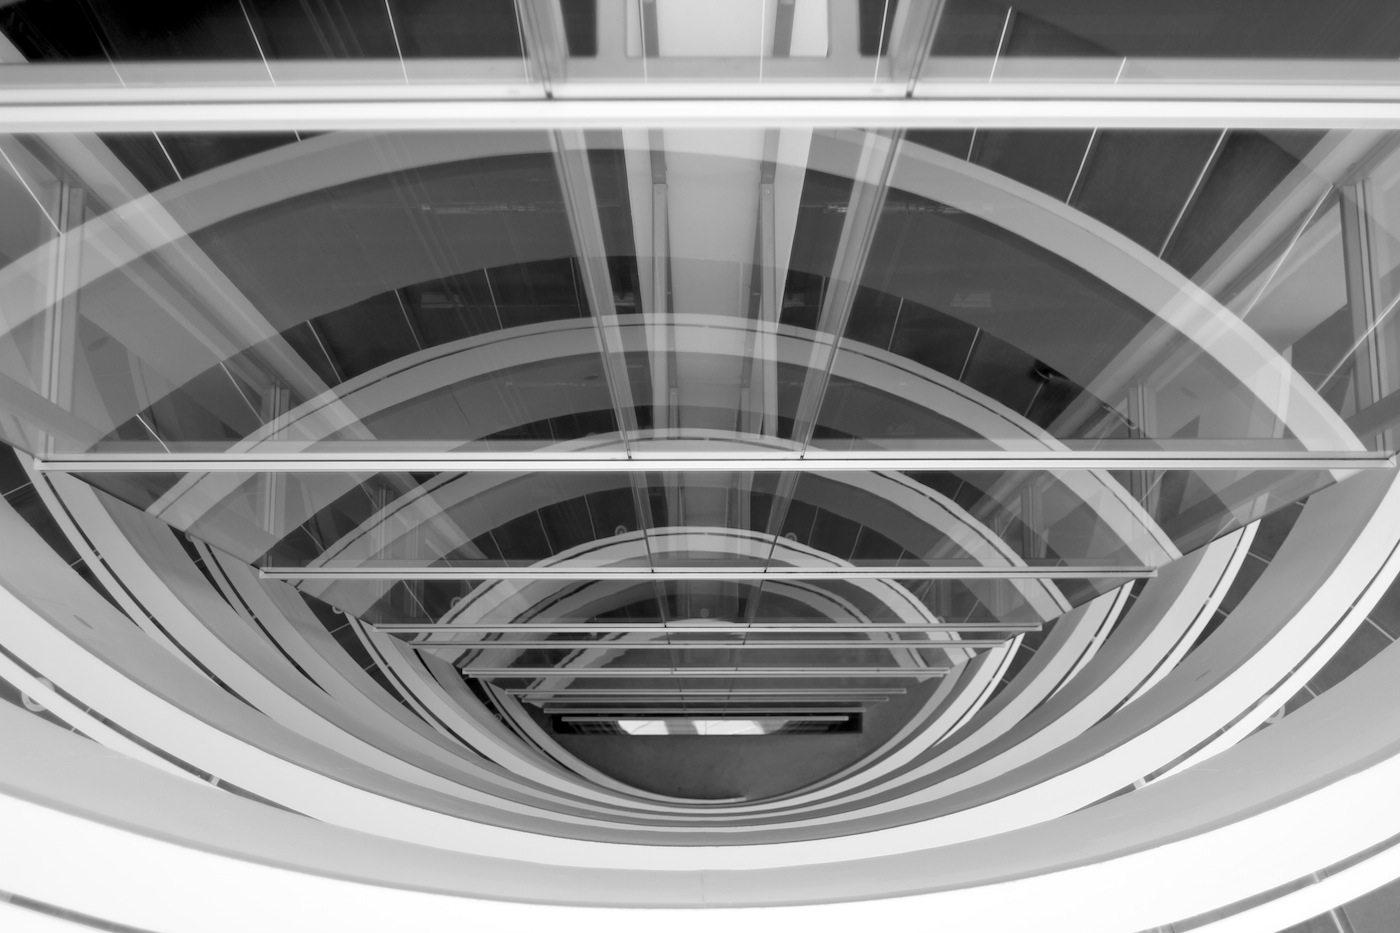 ARoS.  Der charakteristische Treppenturm im Kunstmuseum, entworfen vom Aarhuser Büro Schmidt Hammer Lassen.